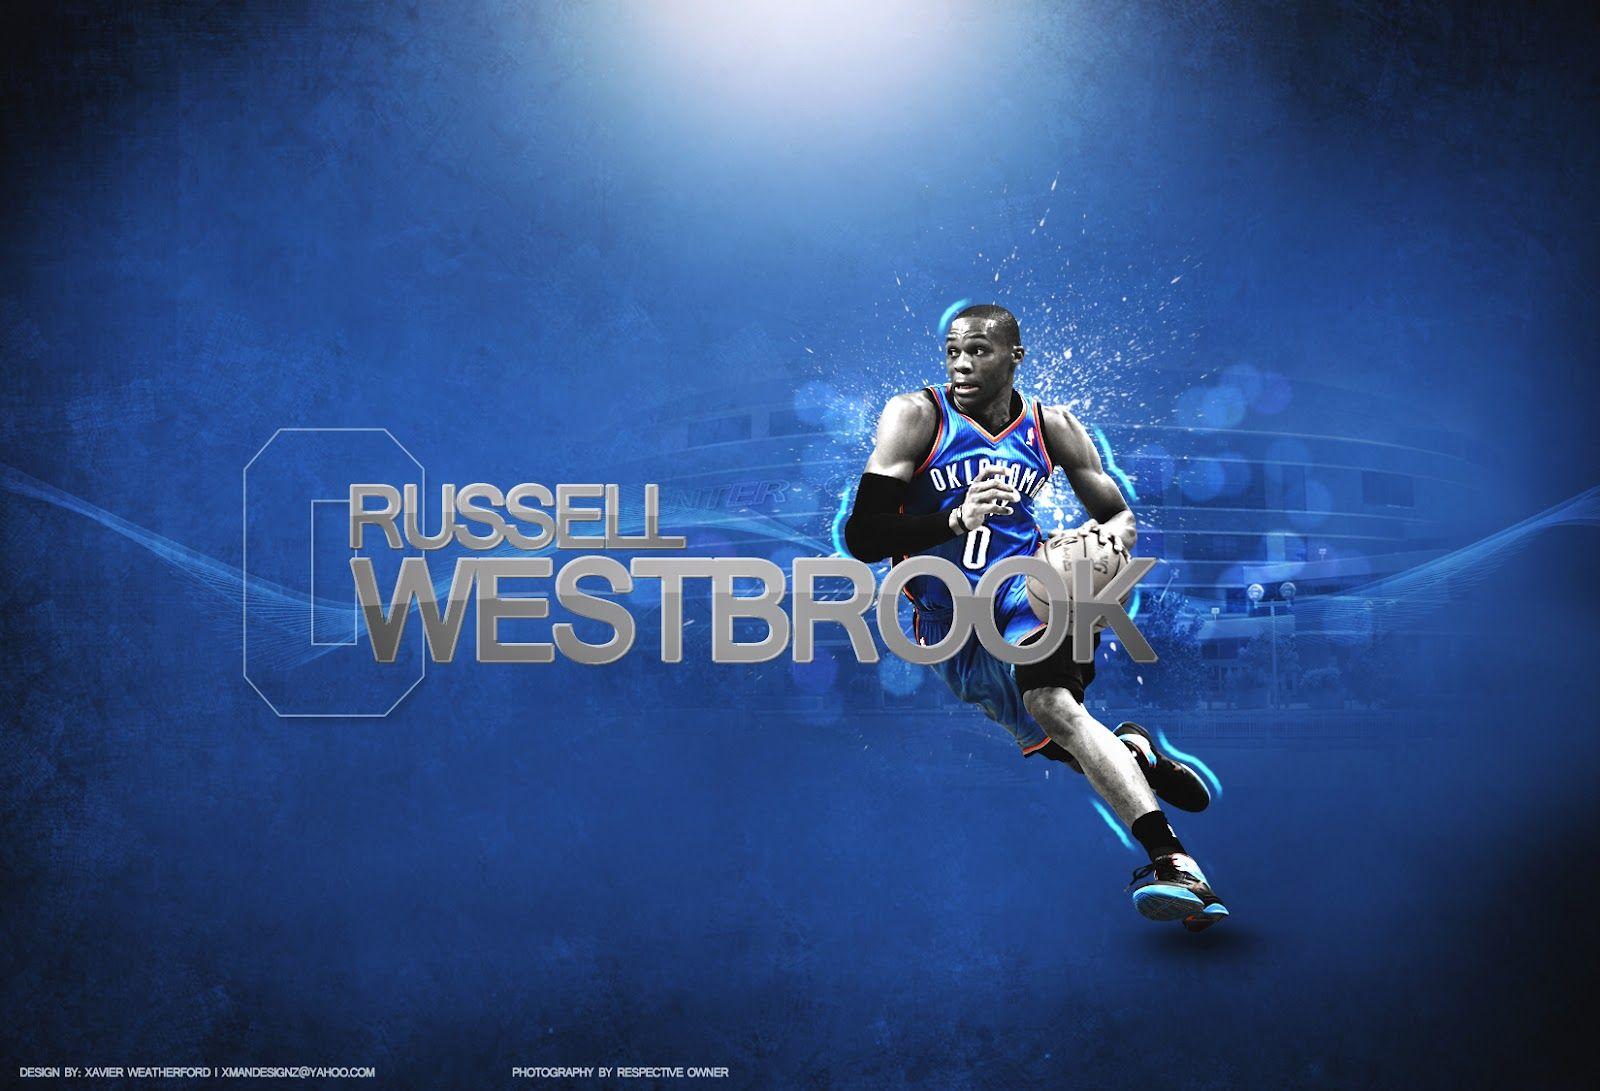 RussellWestbrookBasketballWallpaper.jpg (1600×1091